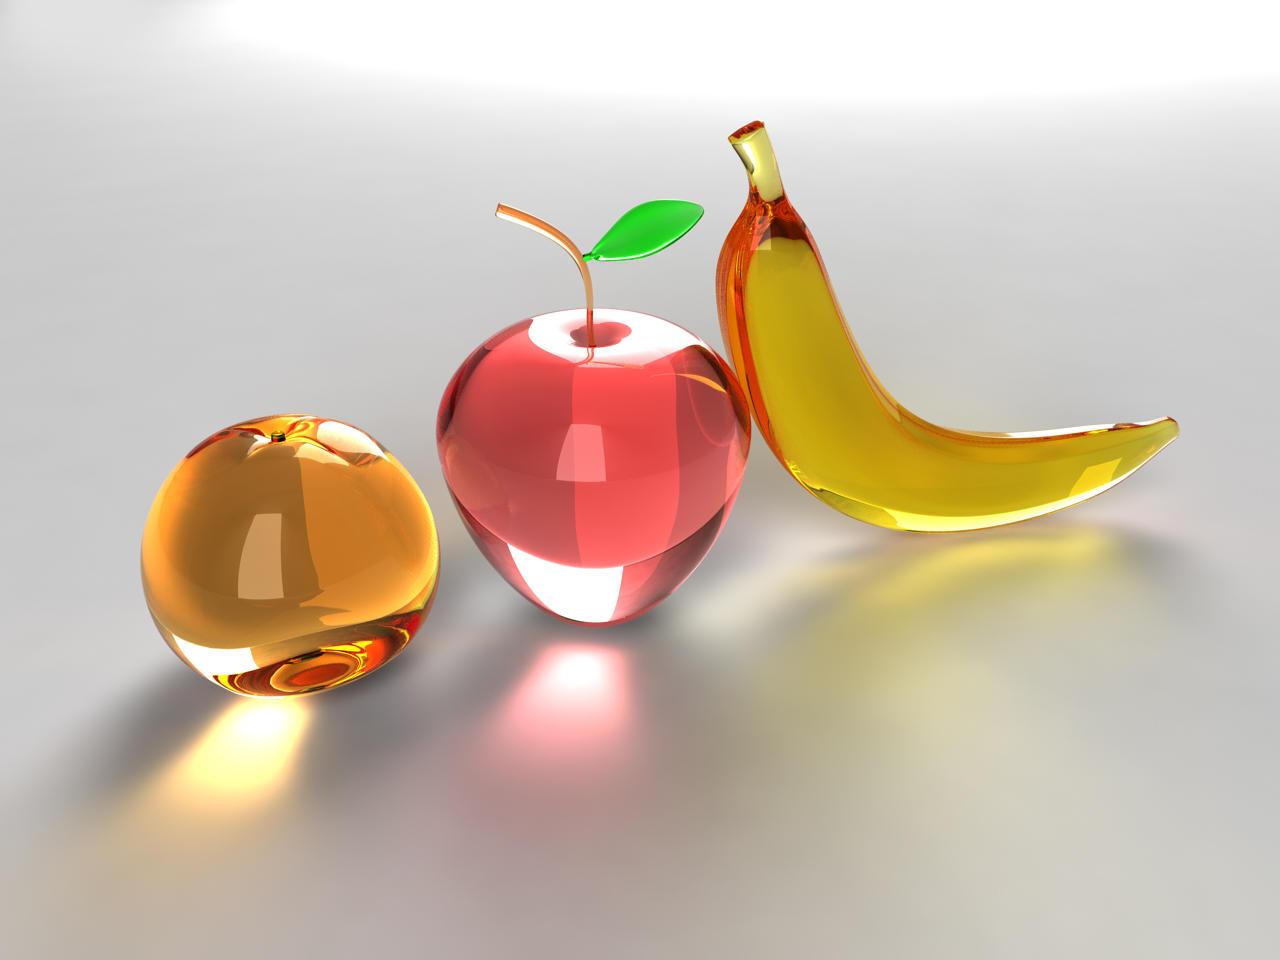 orange apple banana by DivineError